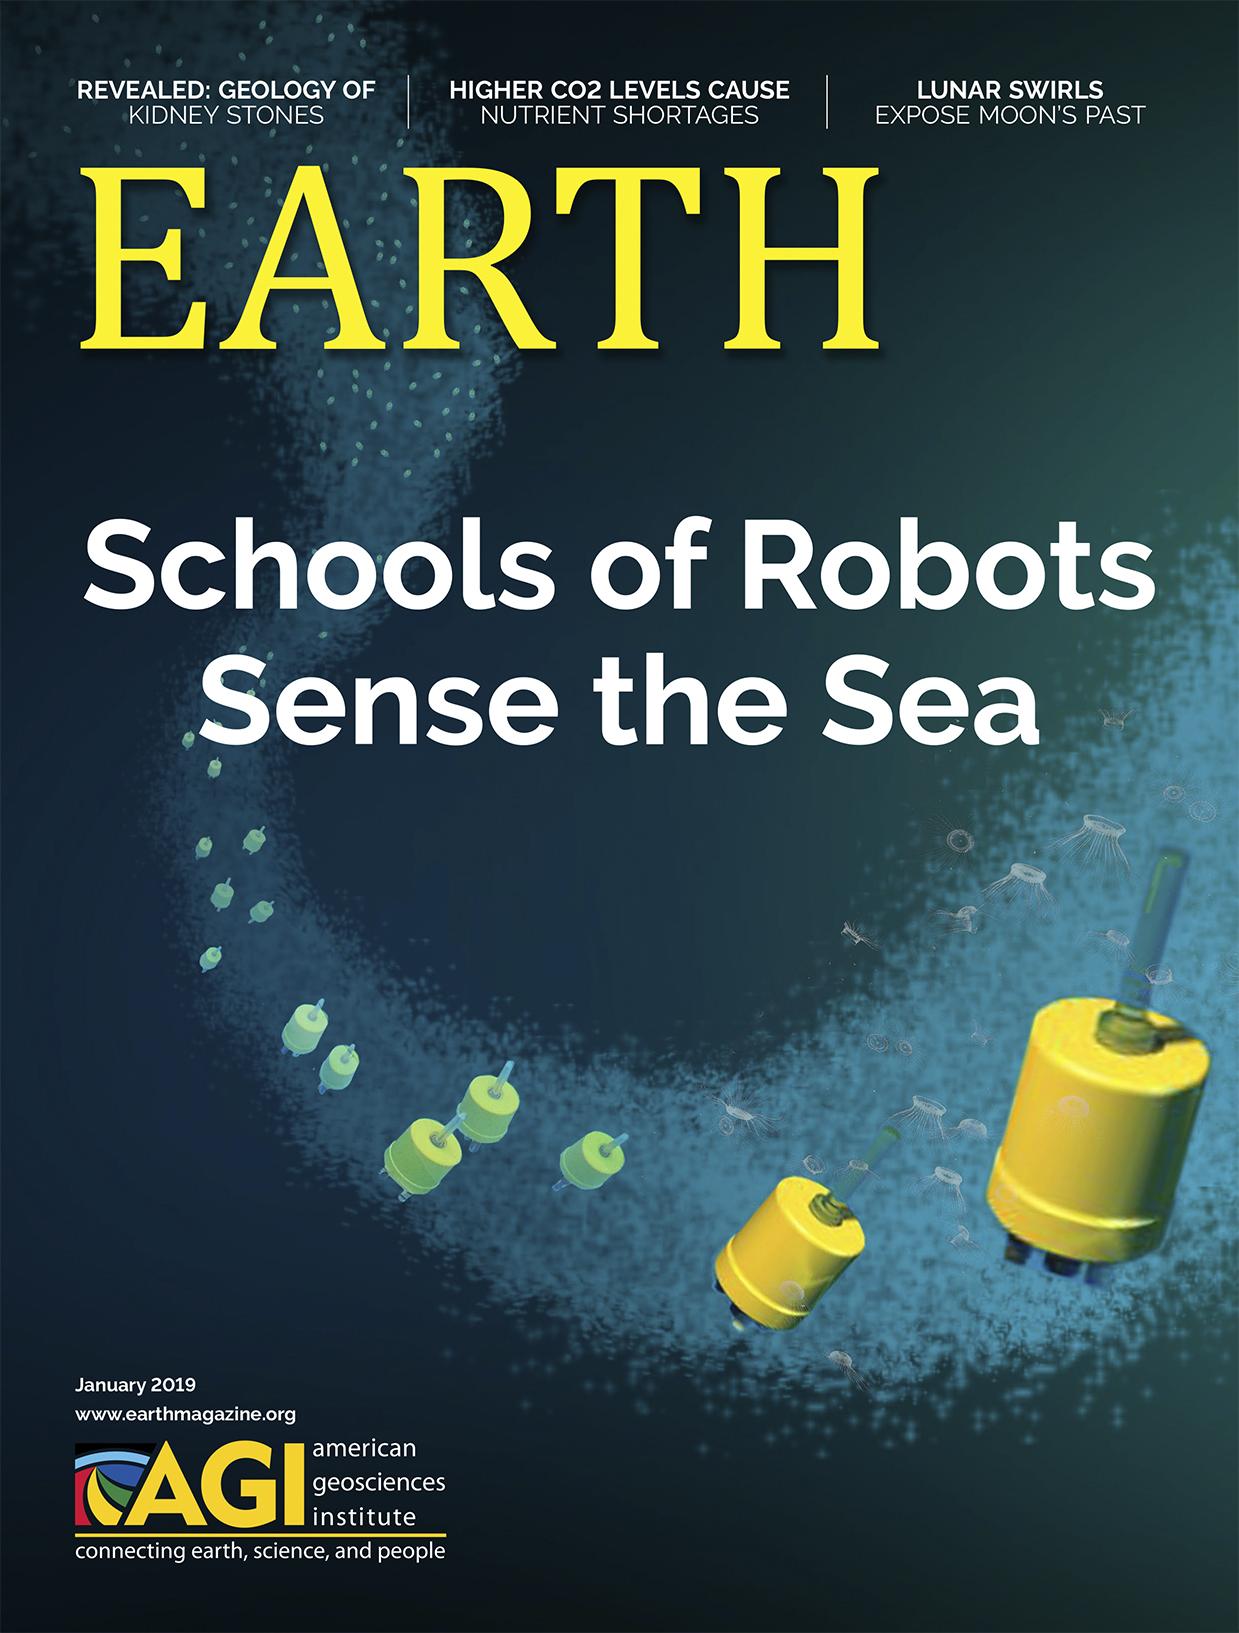 January 2019  EARTH Magazine, layout by Nicole Schmidgall  www.nicoleschmidgall.com